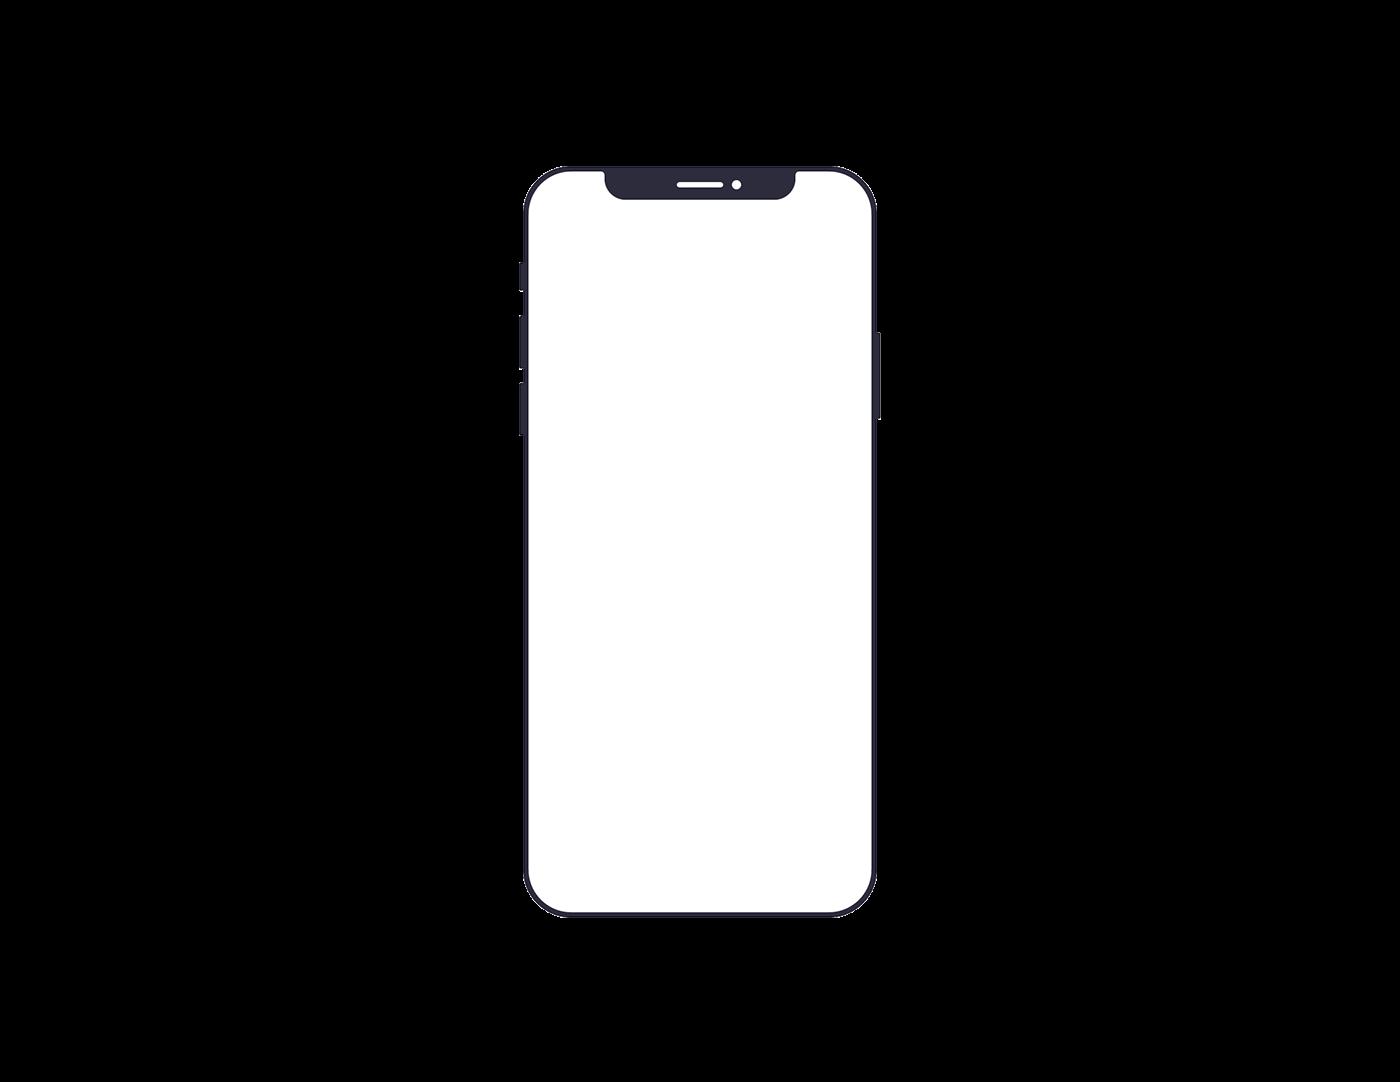 IPhone X Minimalist Wireframe Outline